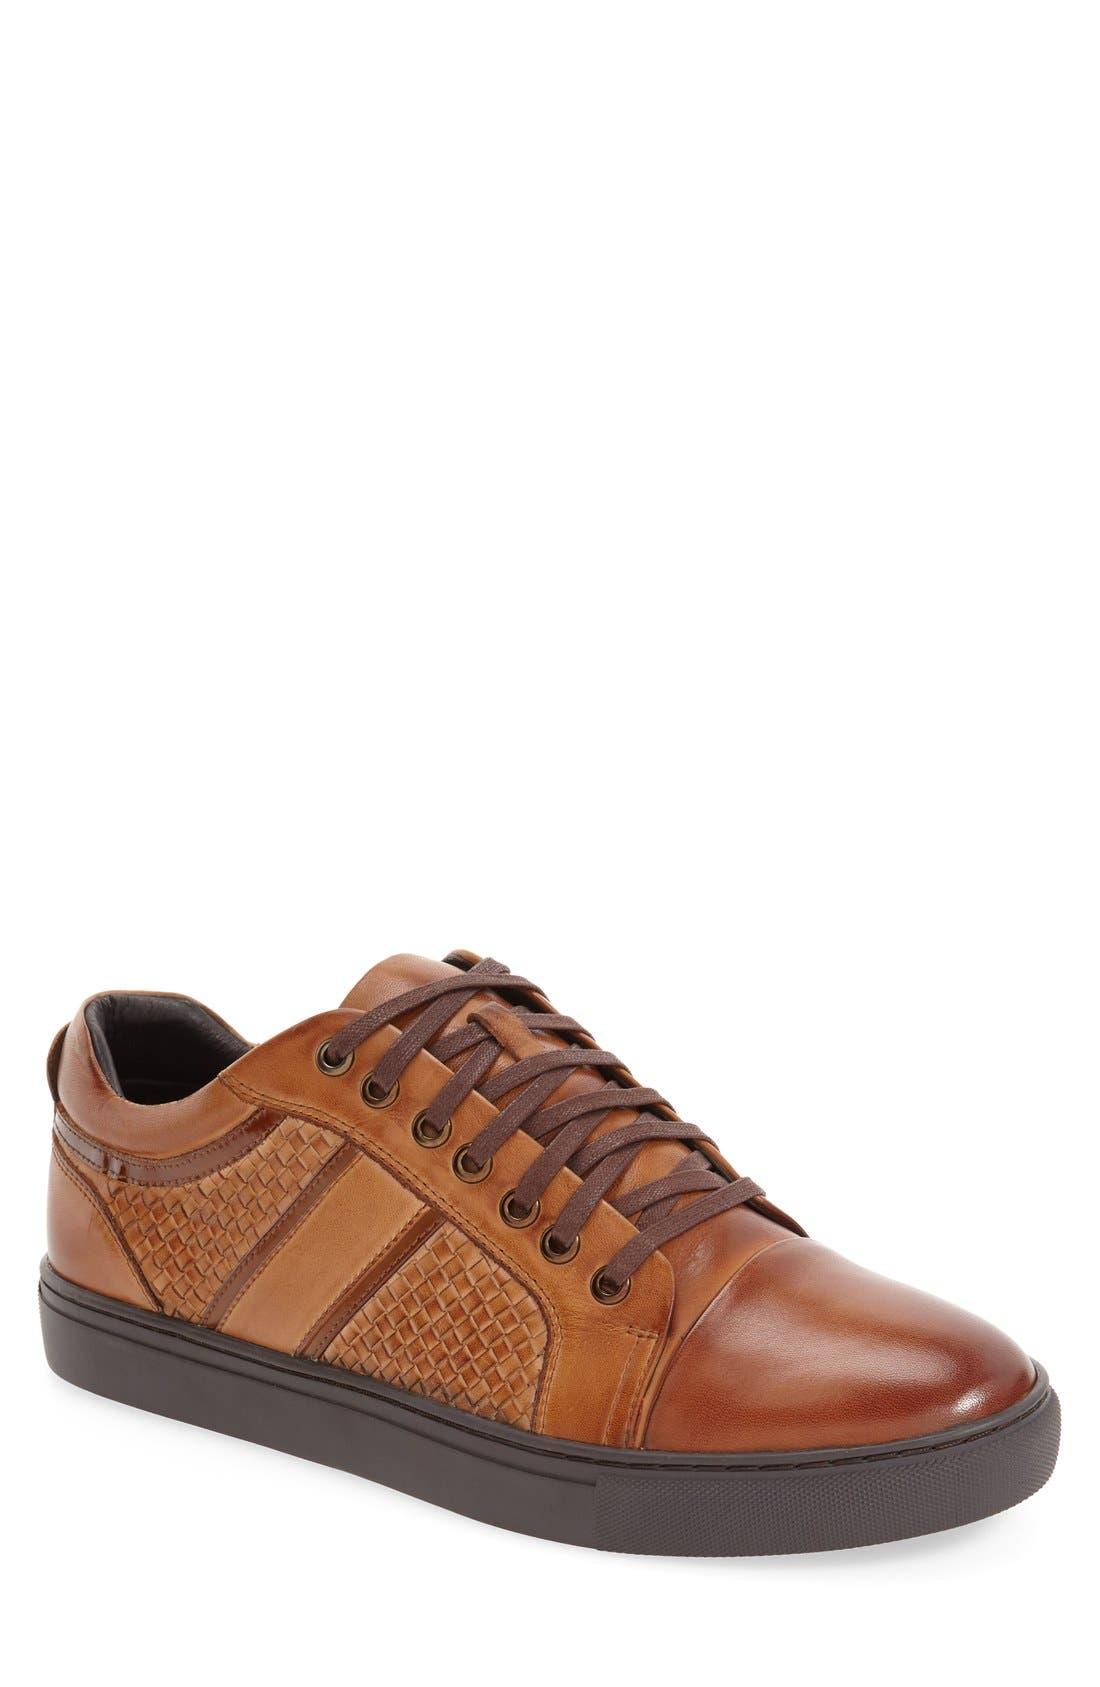 'Rhythm' Woven Sneaker, Main, color, Cognac